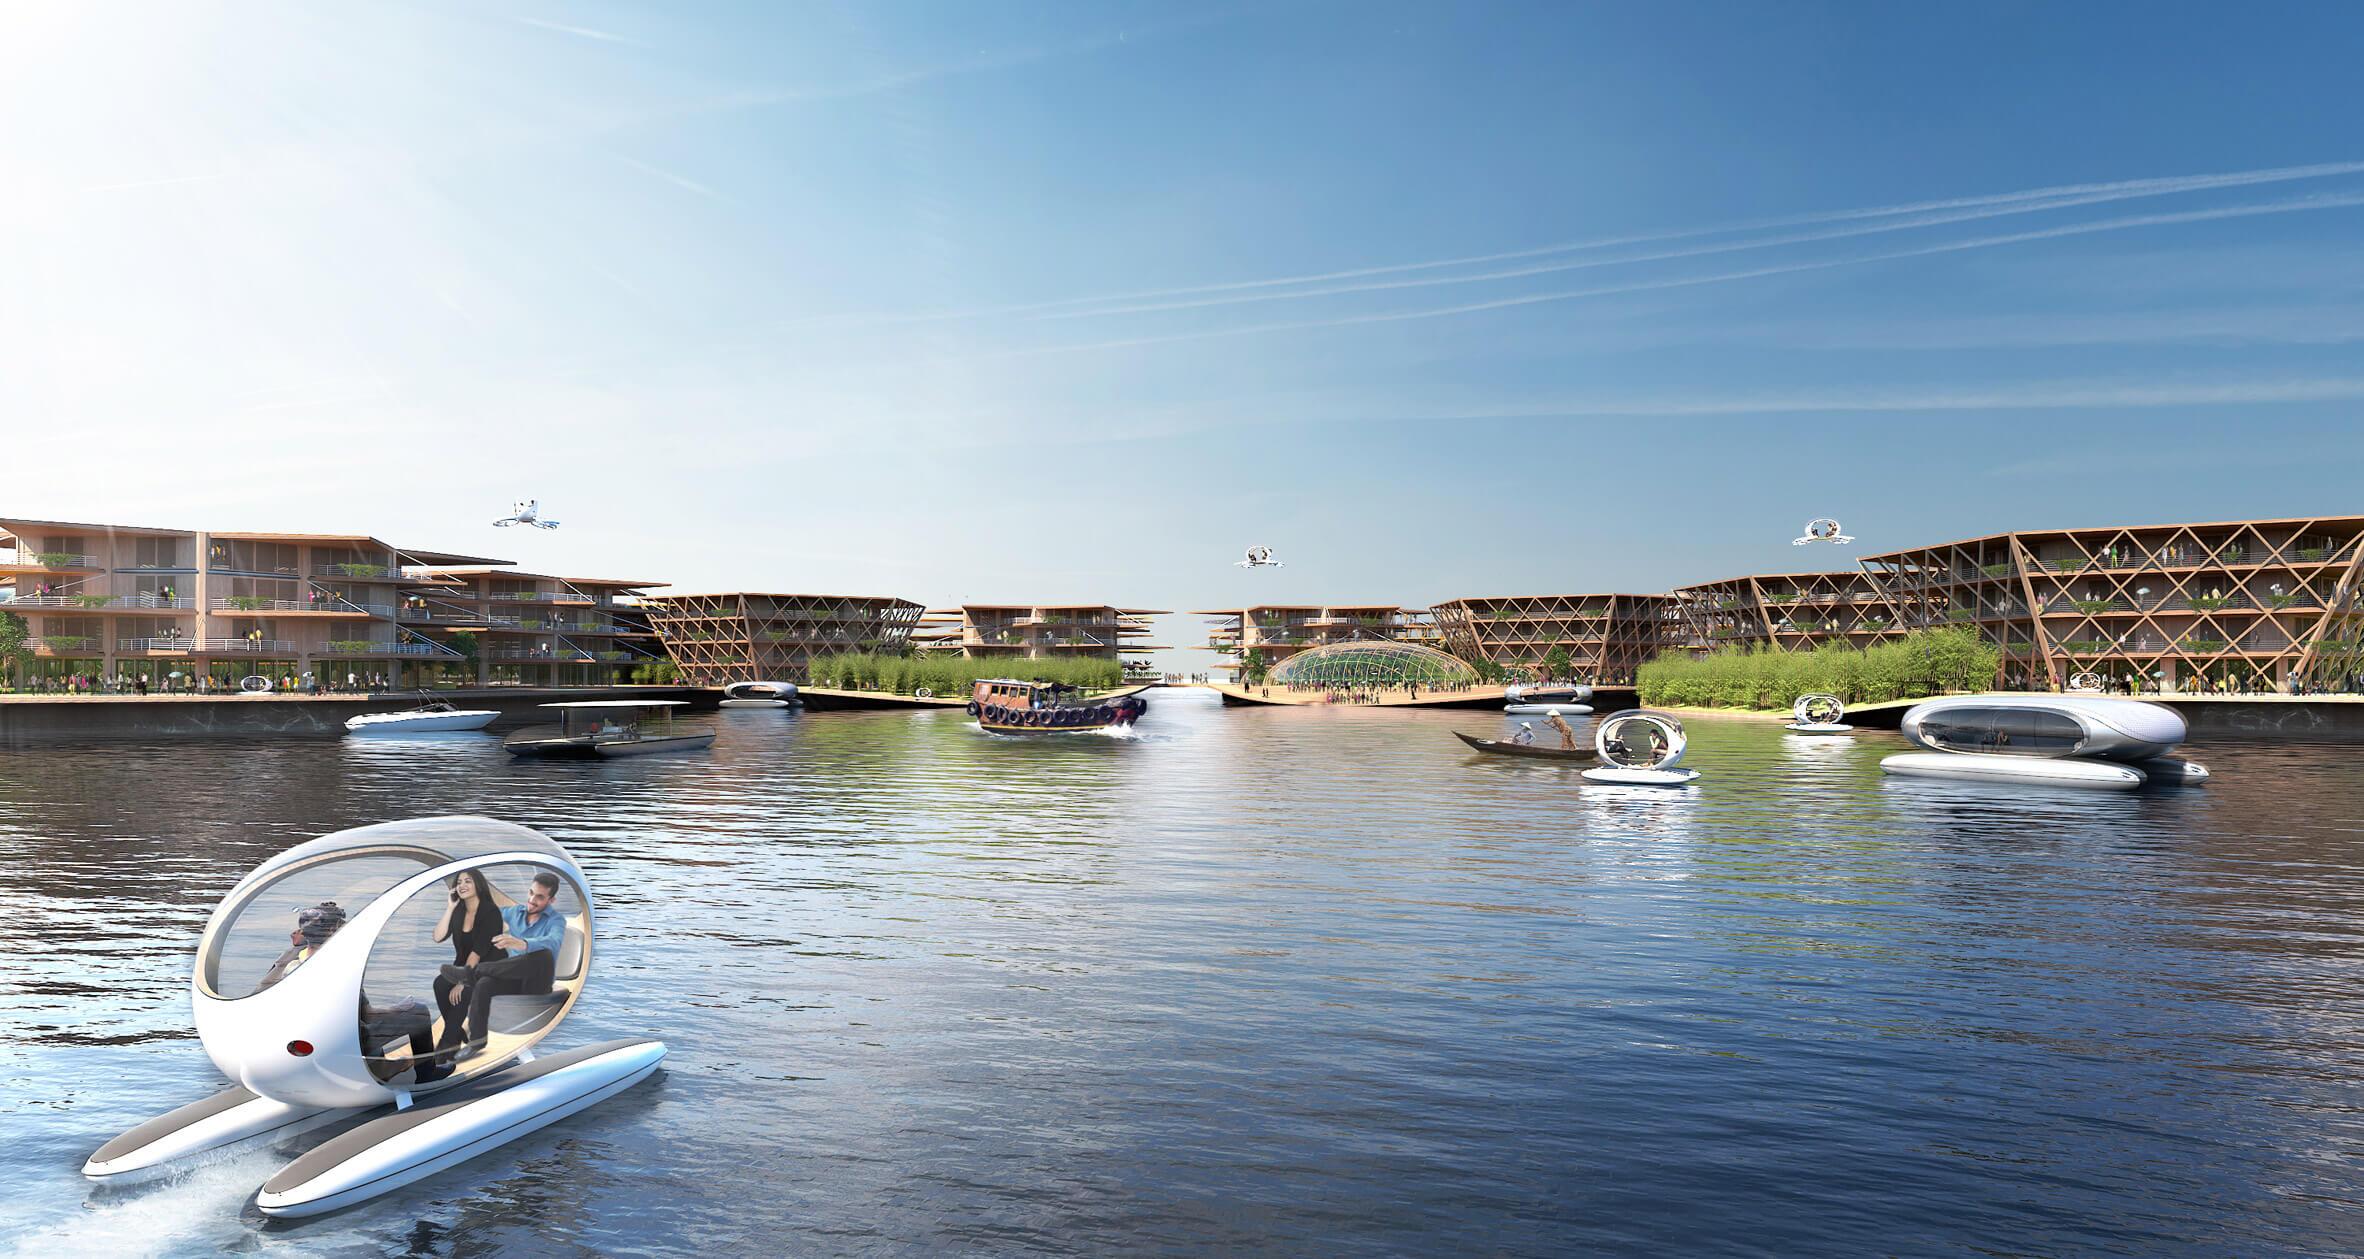 focus-archi-magazine-architectuur-archinews-oceanix-city-floating-city-3.jpg